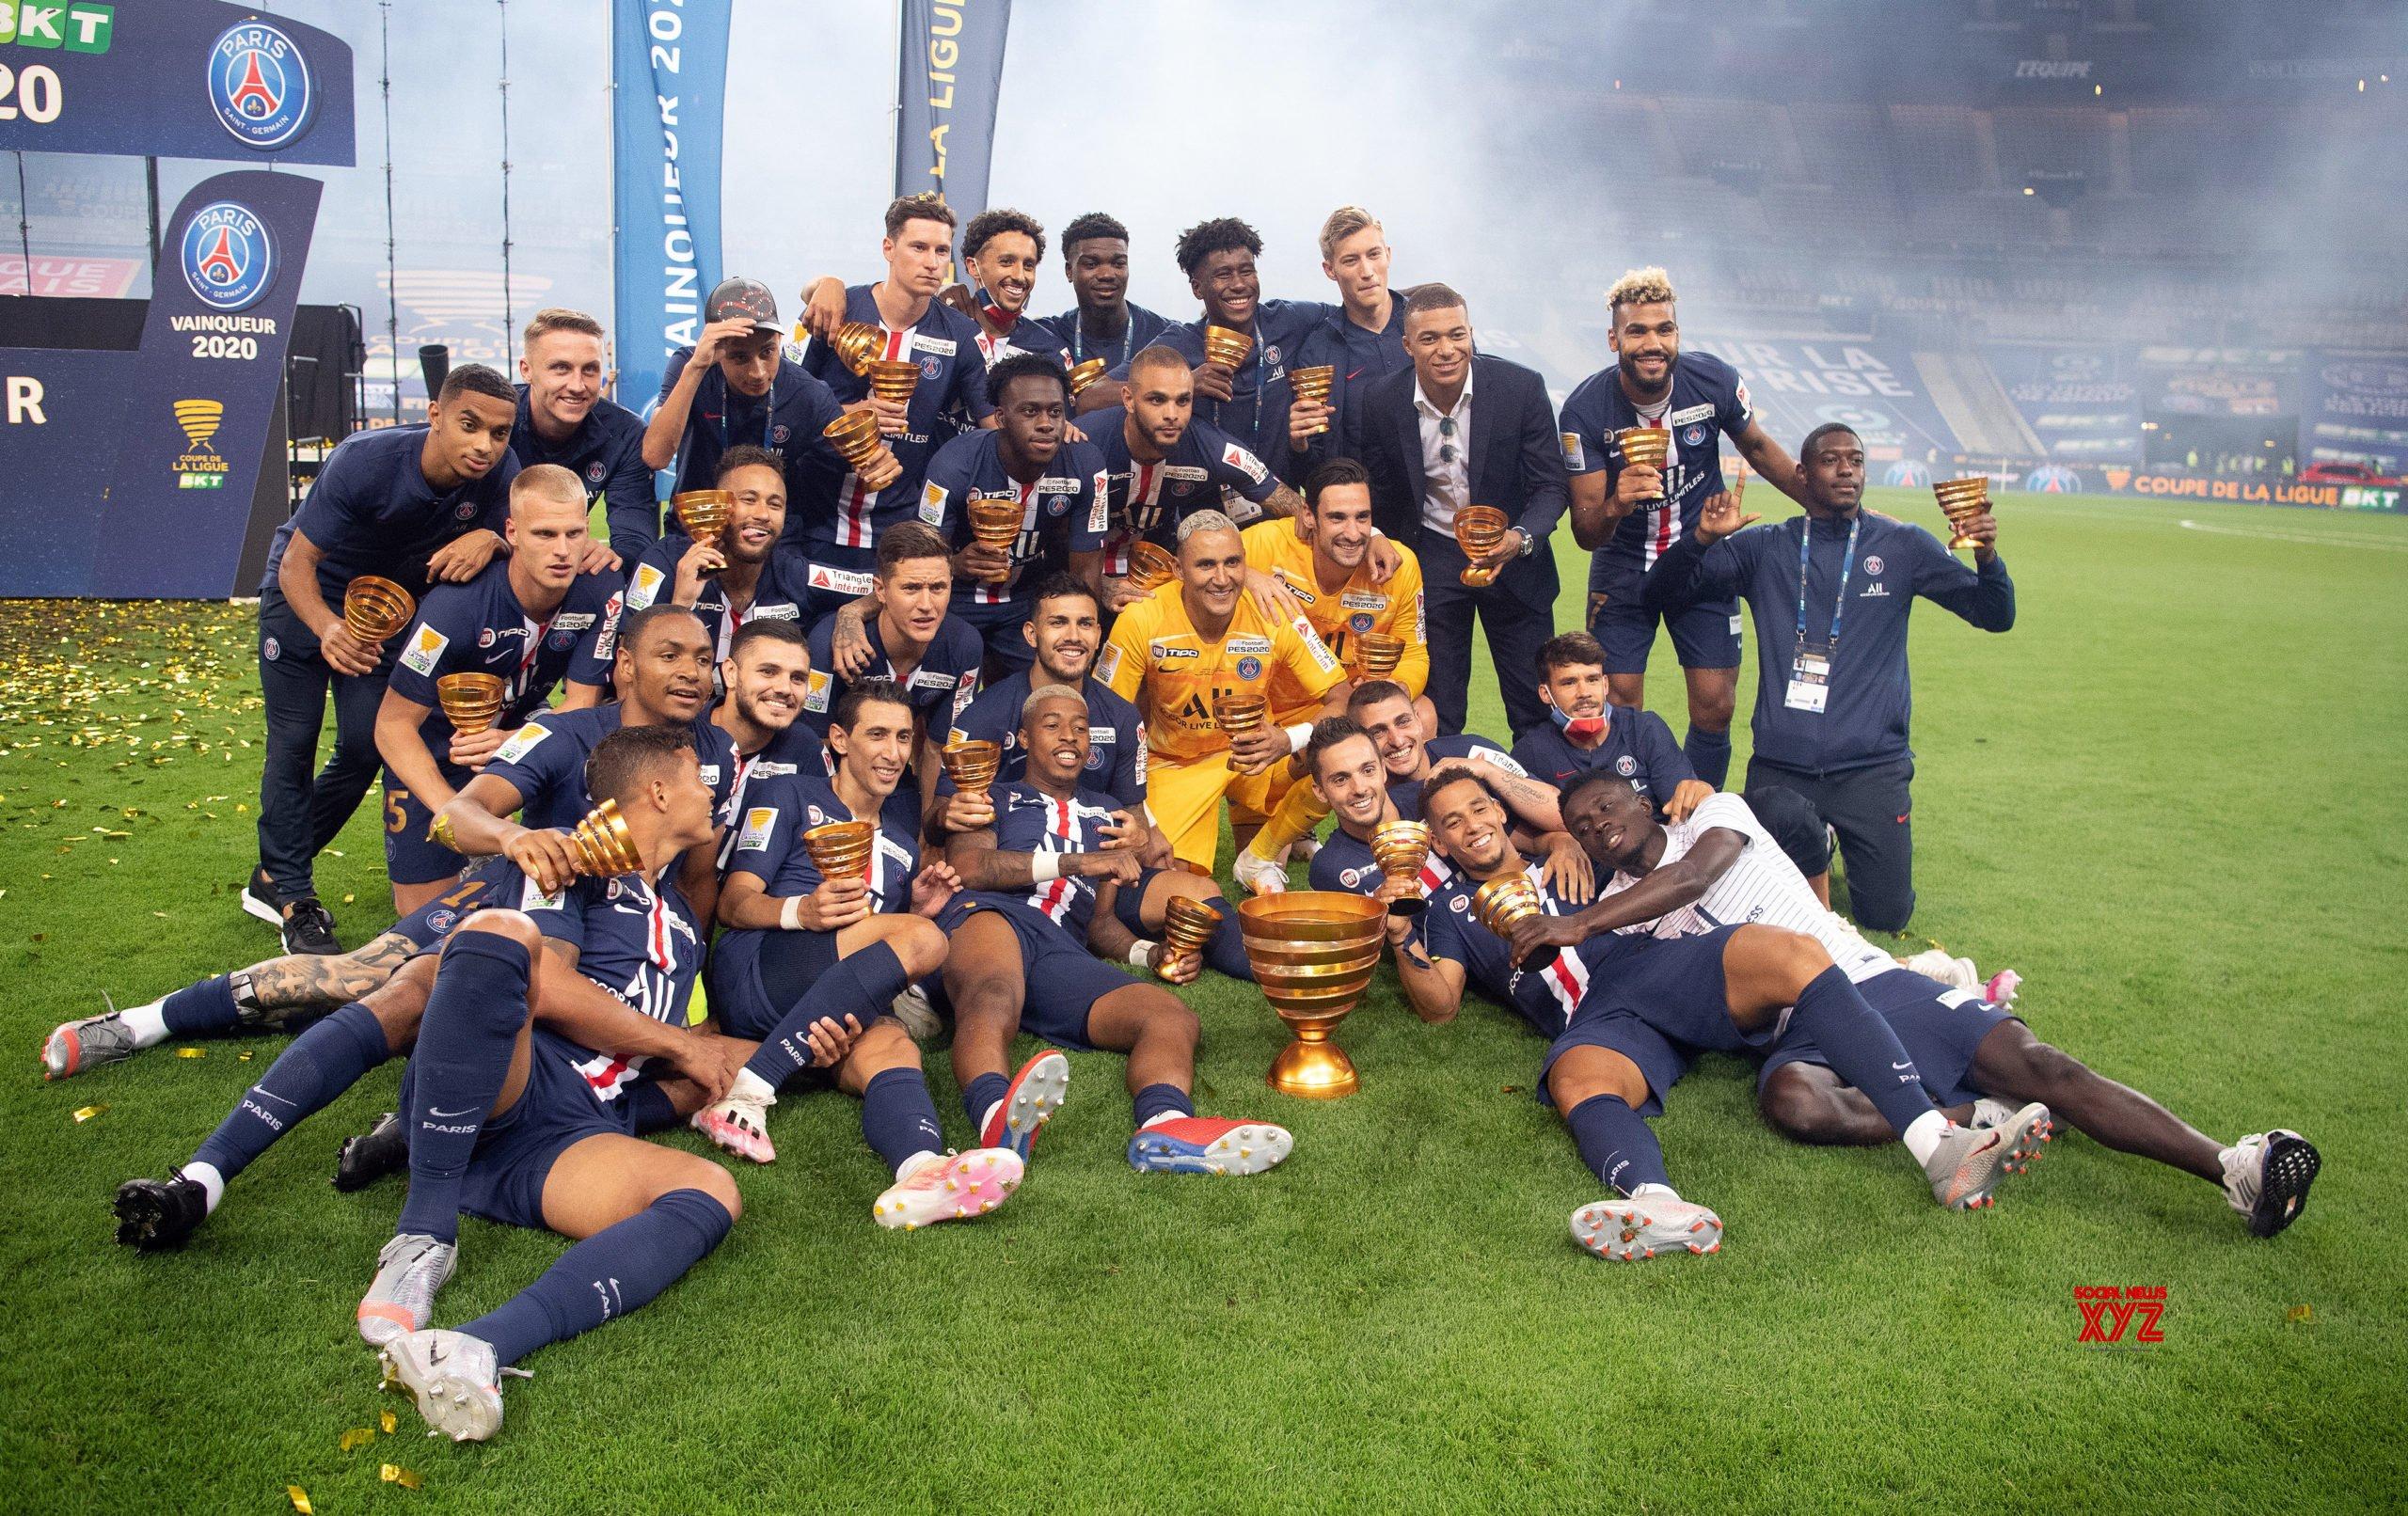 FRANCE - PARIS - FOOTBALL - FRENCH LEAGUE CUP - FINAL - PSG VS LYONNAIS #Gallery